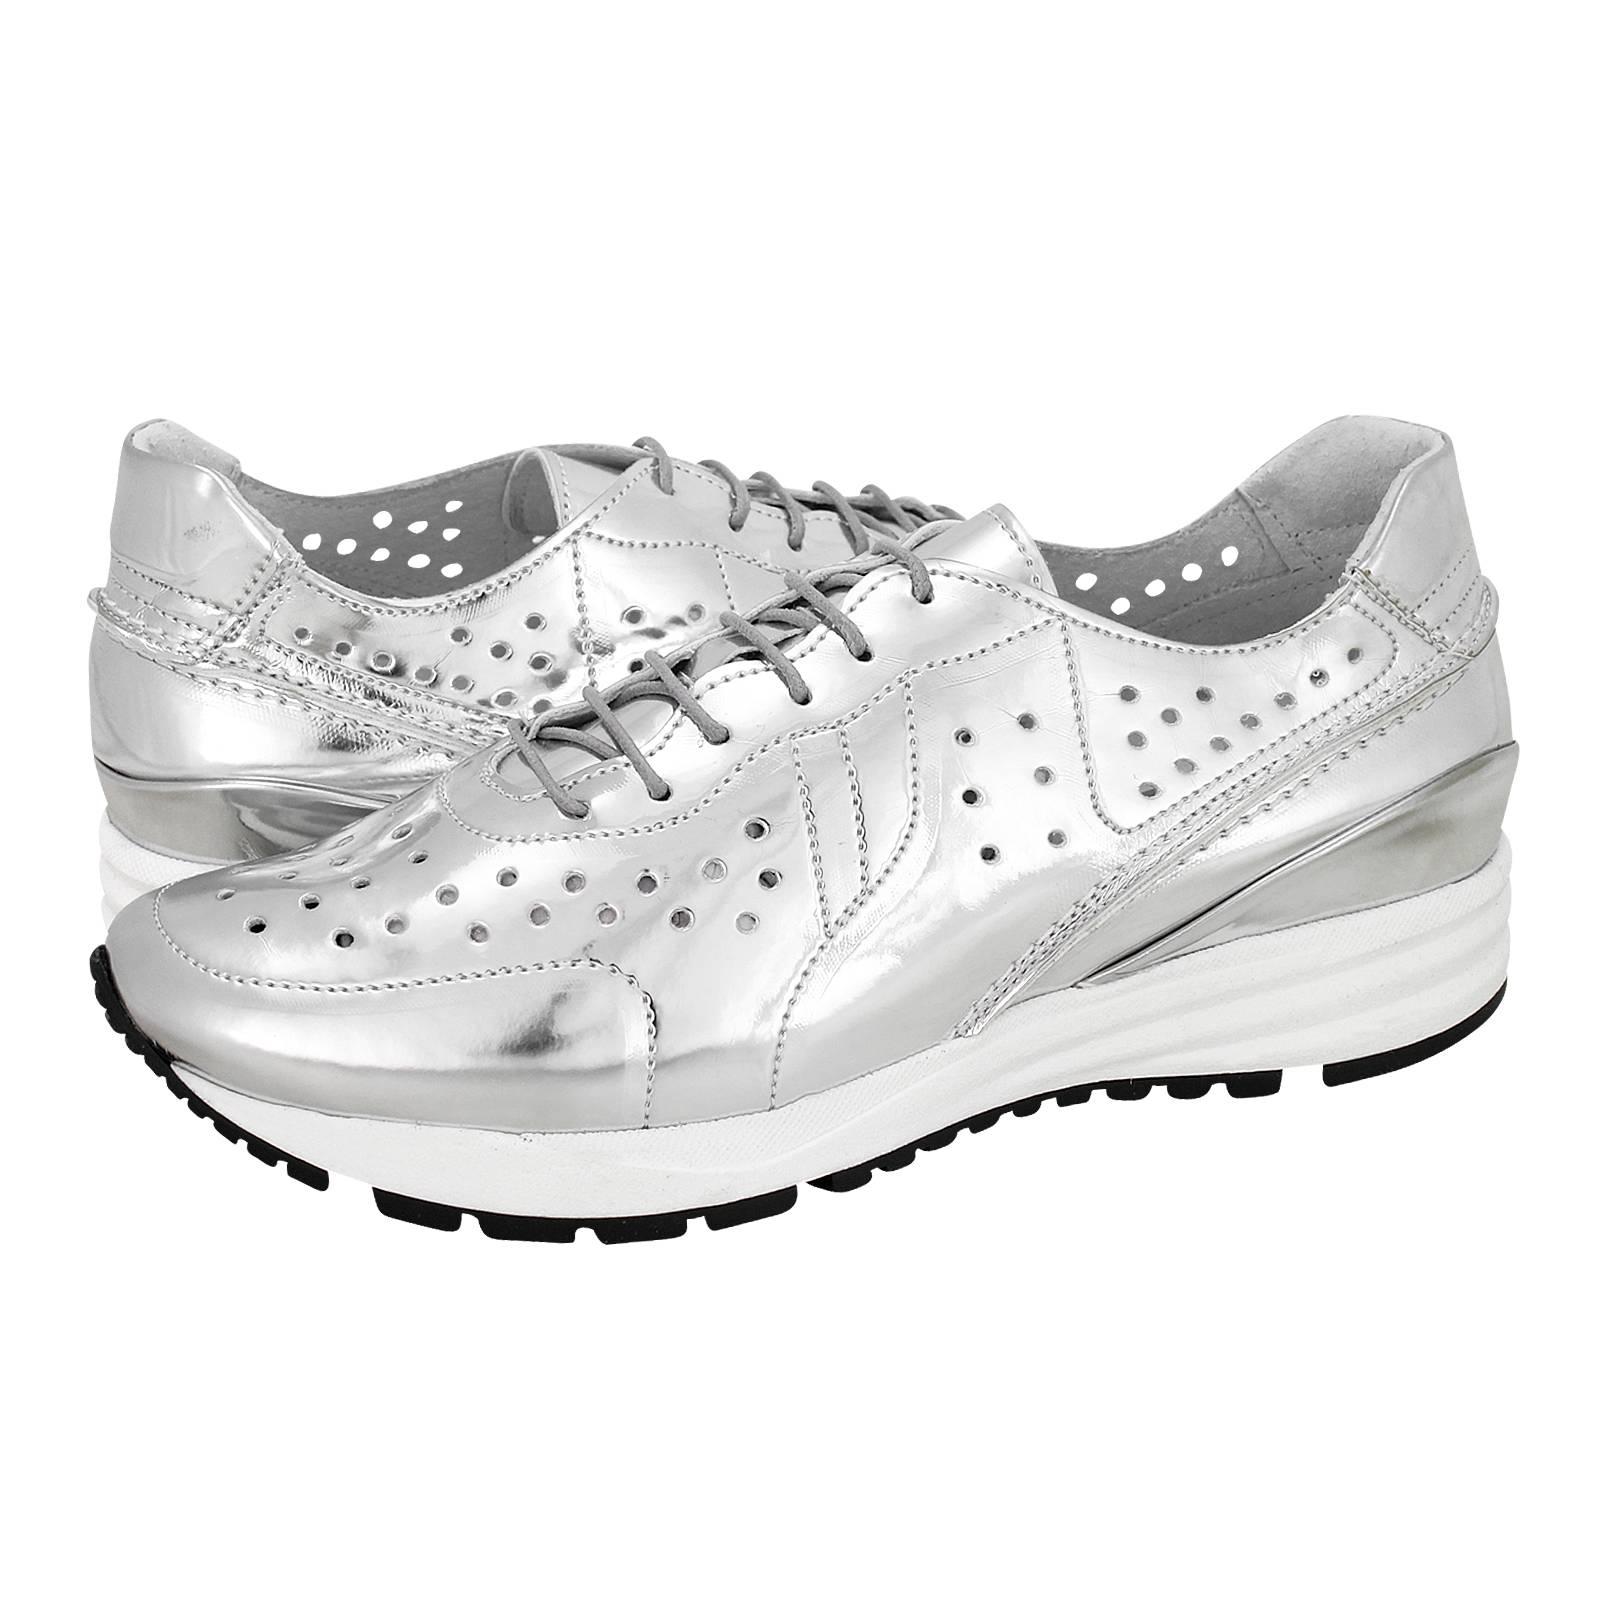 Carini - Γυναικεία παπούτσια casual Kricket από δερμα συνθετικο ... befbbeb0930